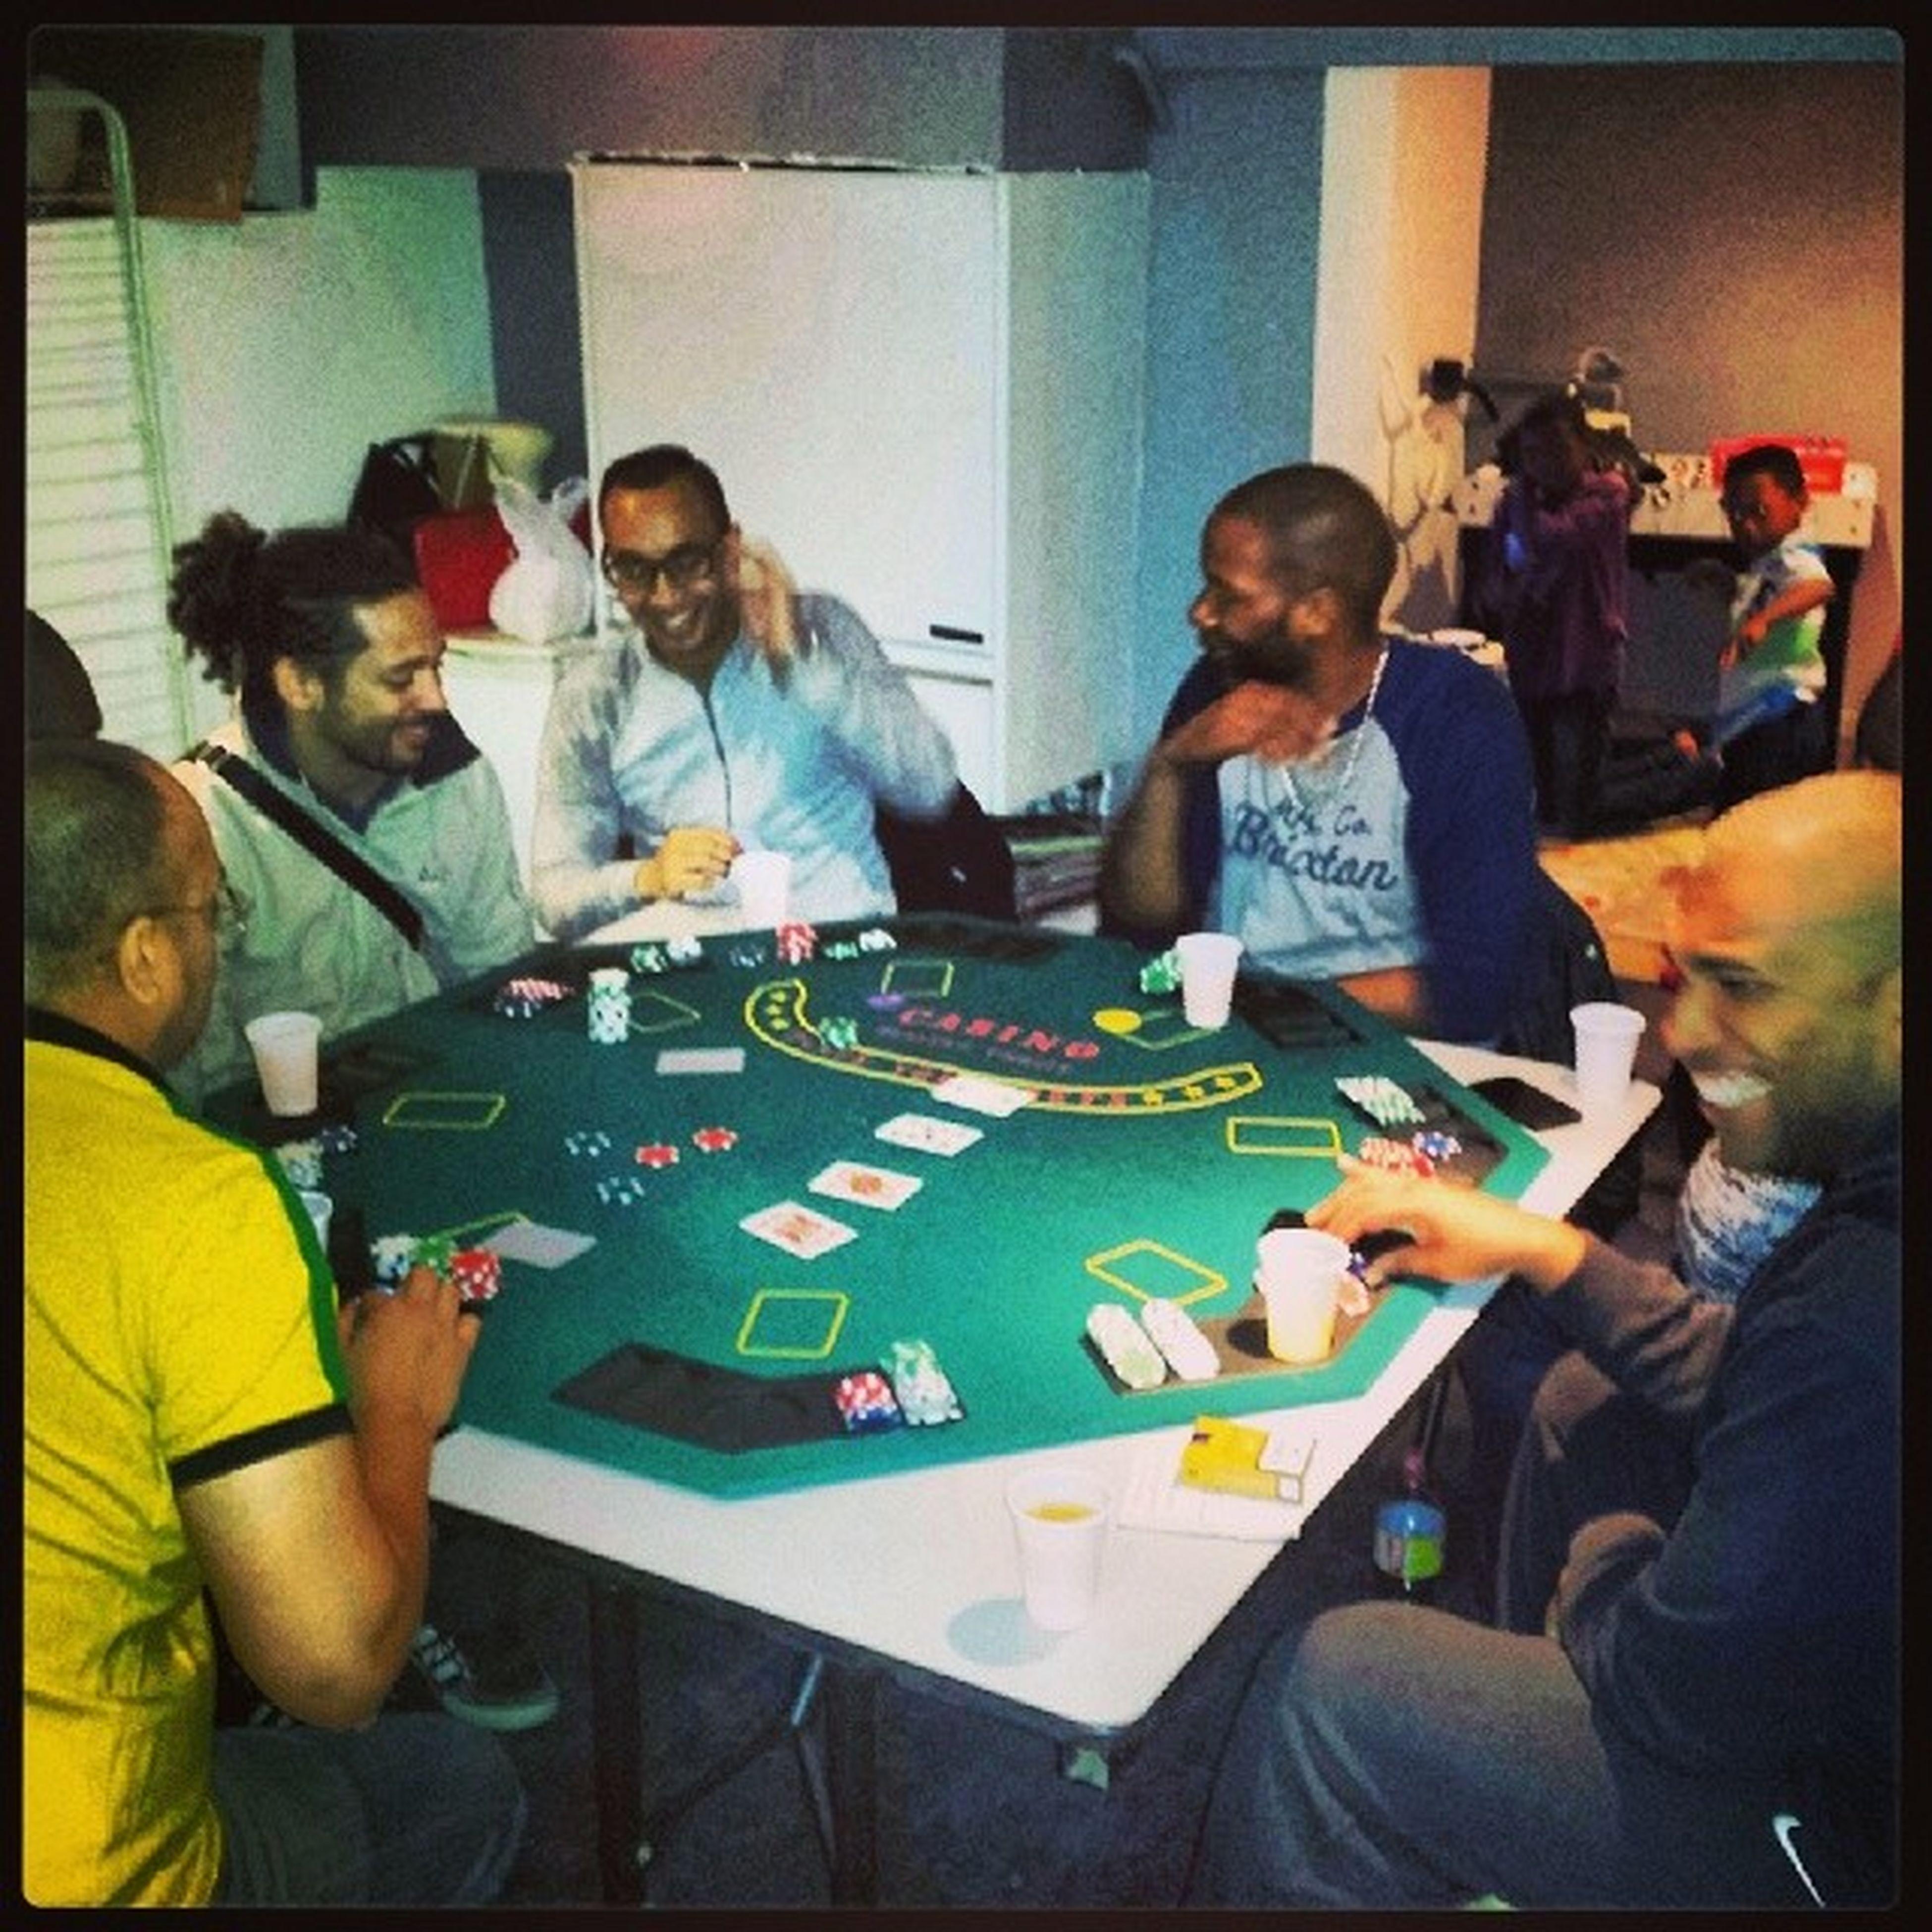 Bail2Poker Instamoments Ohmerde PokerTime SoireeACreditBlaguesGourouMetsBoitePatrickBruelPayeEnTR